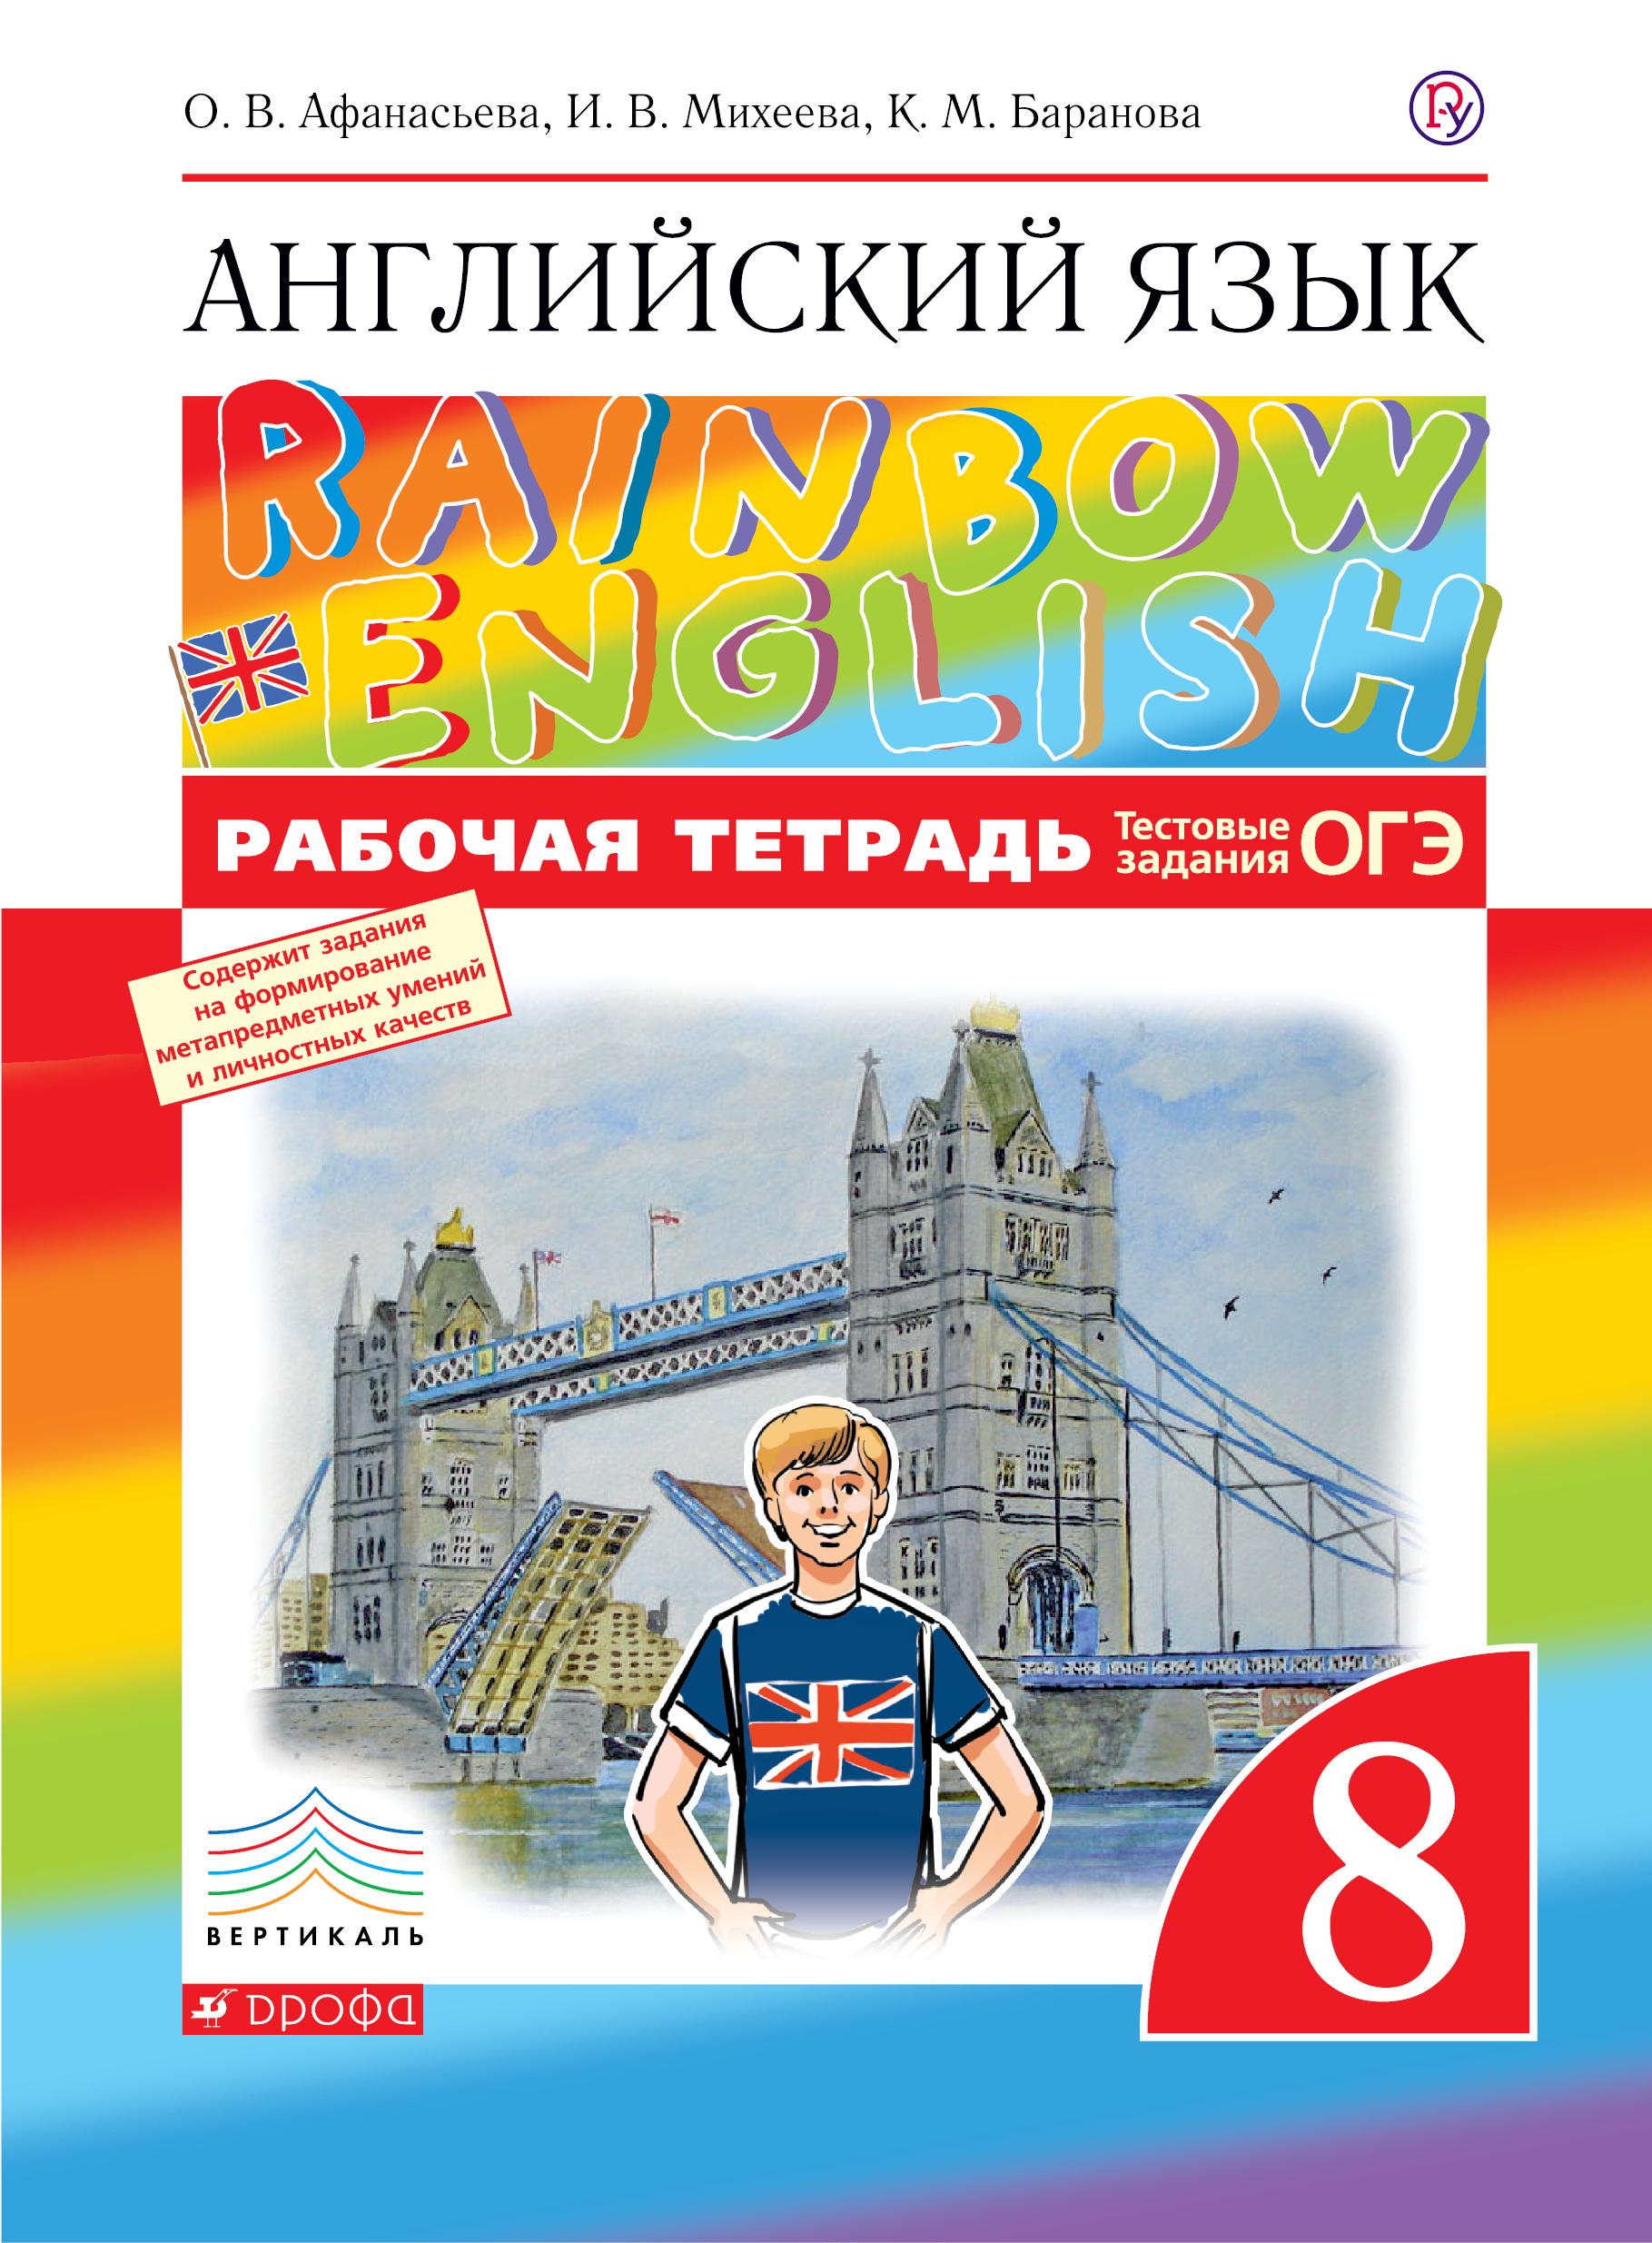 английский язык 7 класс афанасьева михеева баранова гдз фгос